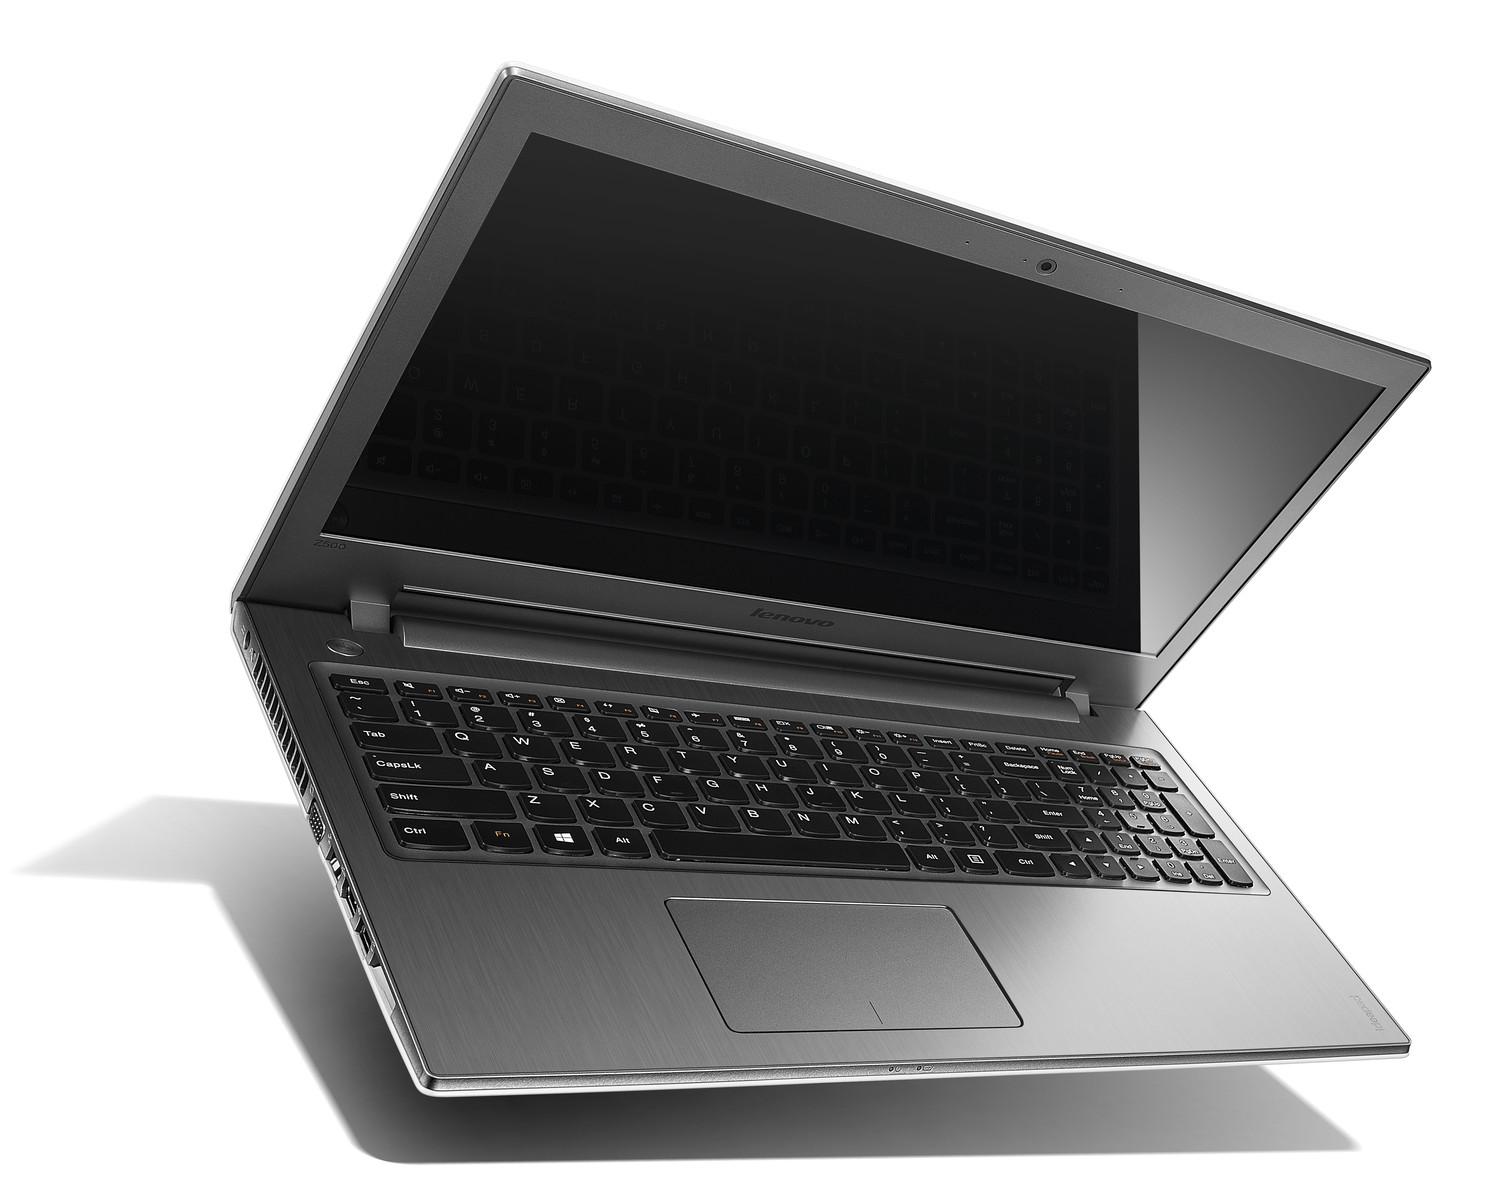 Lenovo Updates Ideapad Y And Z Series Notebooks For Windows 8 Batre Leptop Z470 Z500